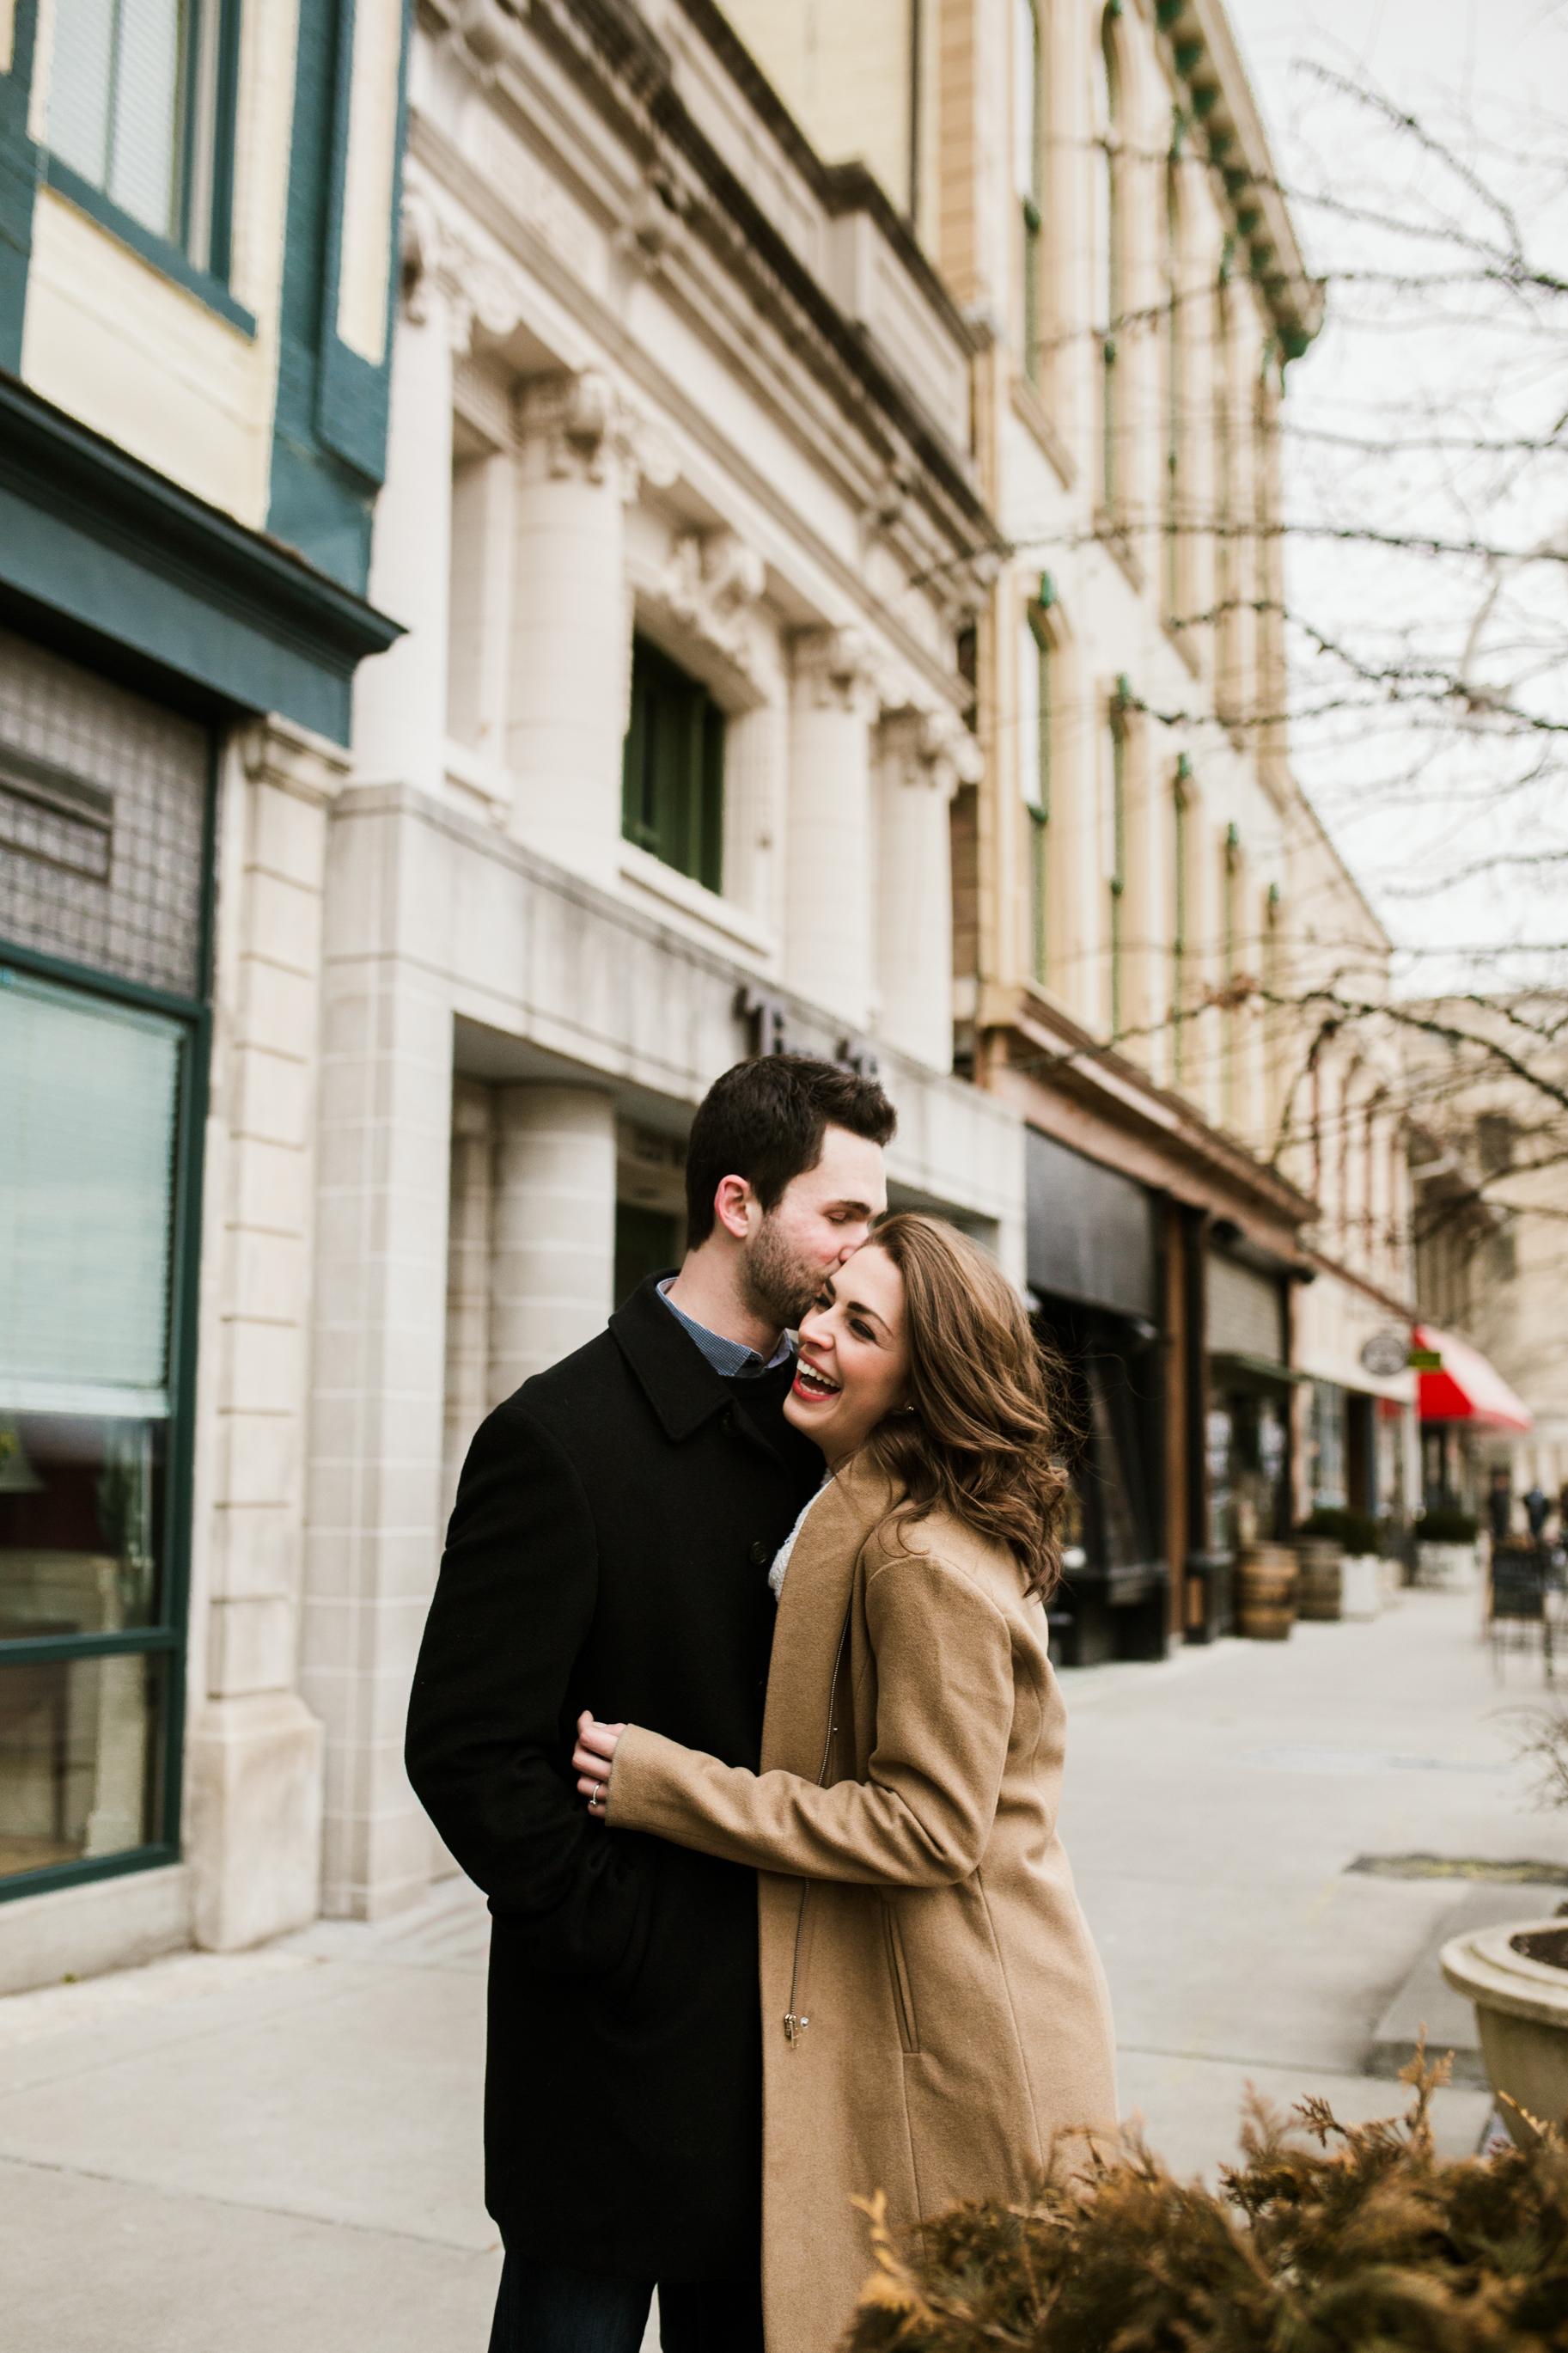 Ellen & Lee Engagement 2018 WEBSITE SP Crystal Ludwick Photo (42 of 54).jpg